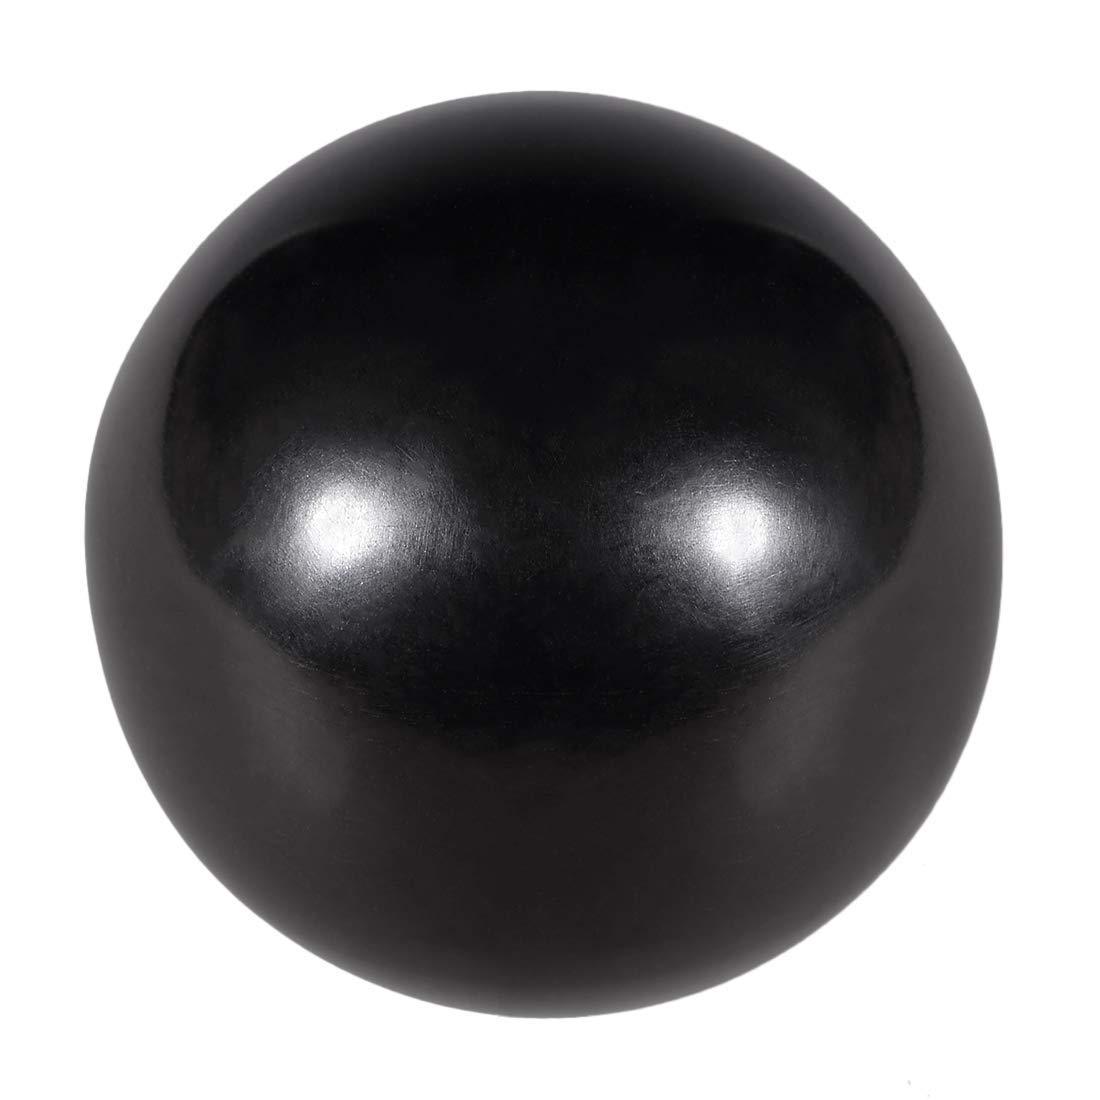 5 Pieces M6 thermoset Ball knob Female Thread Machine Handle 25 mm Diameter Smooth Edge Black